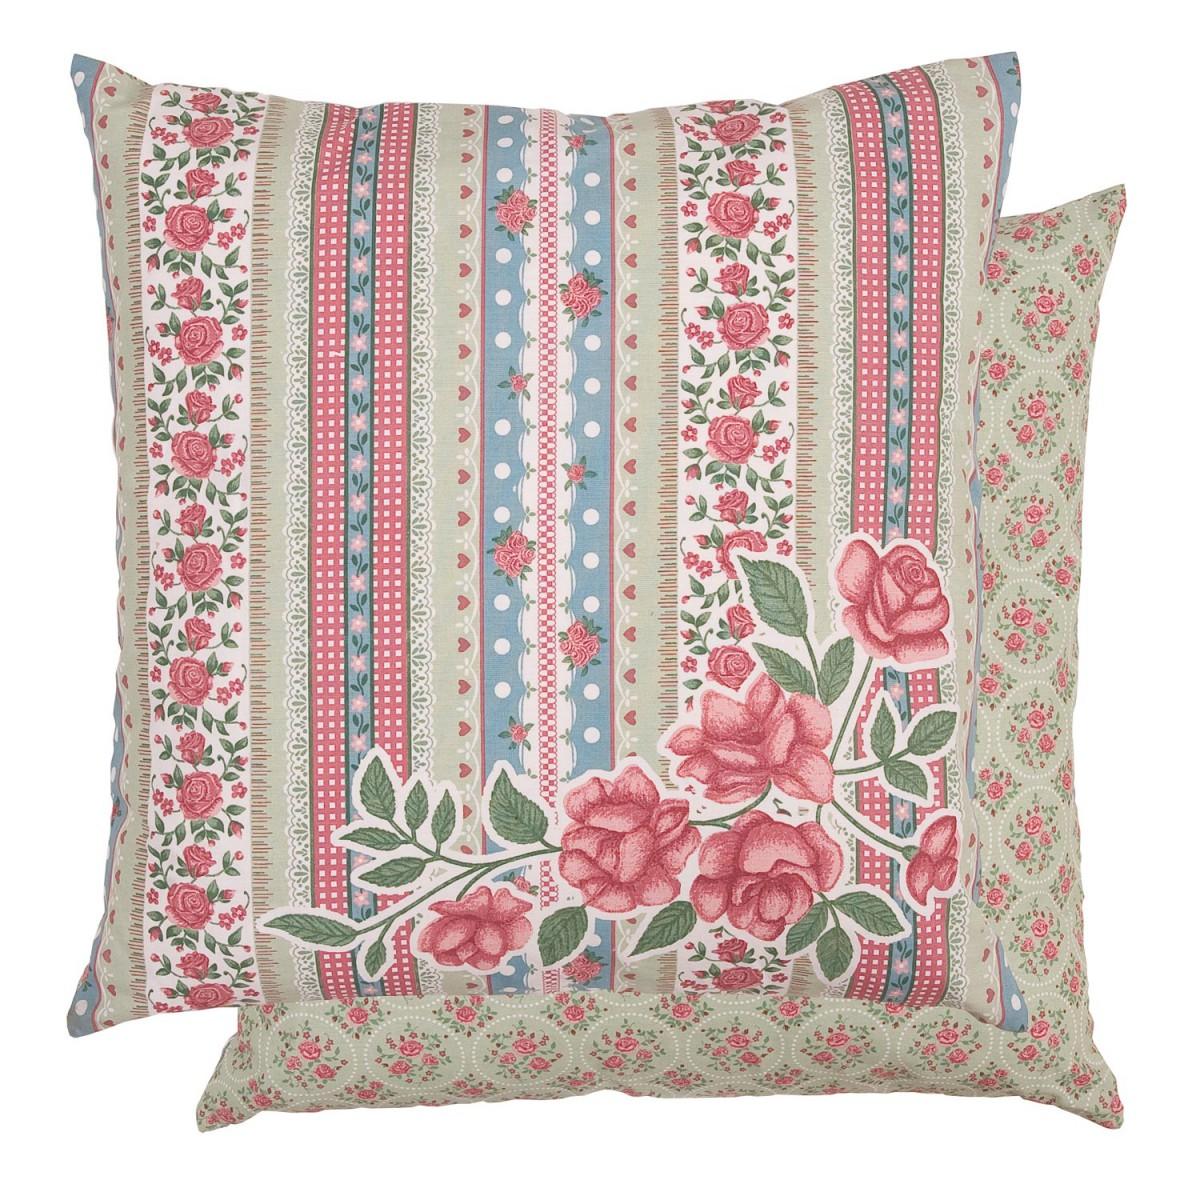 clayre eef kissenh lle rosen patchwork 50x50cm wohntextilien kissen flowers. Black Bedroom Furniture Sets. Home Design Ideas